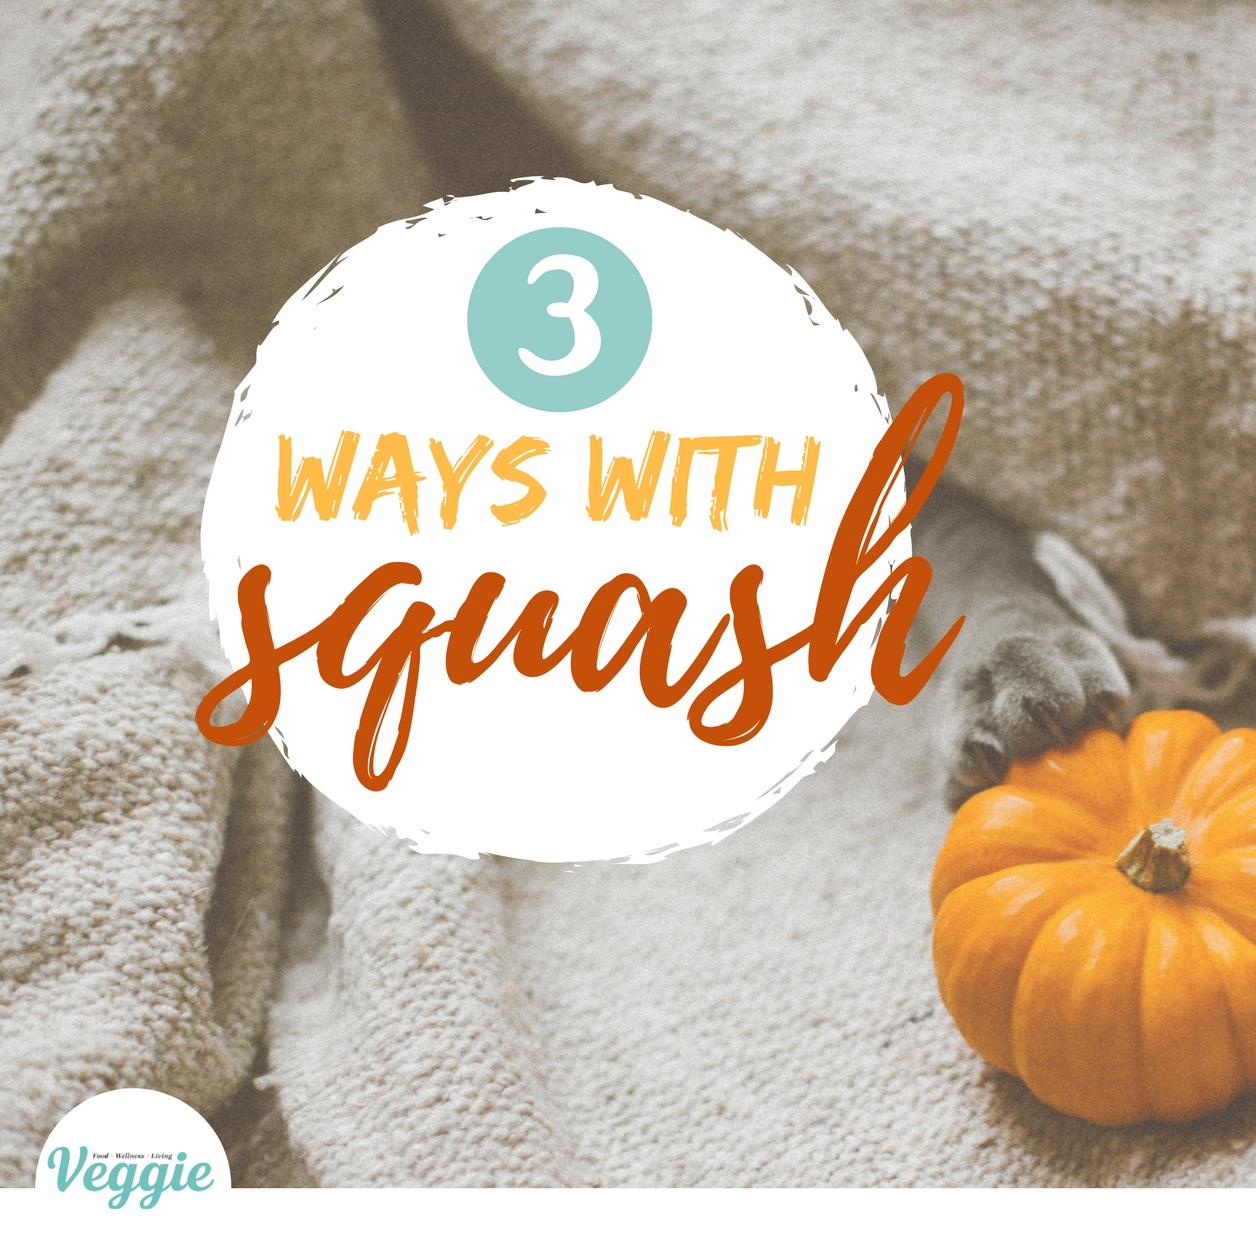 Veggie Magazine: 3 Ways with Squash